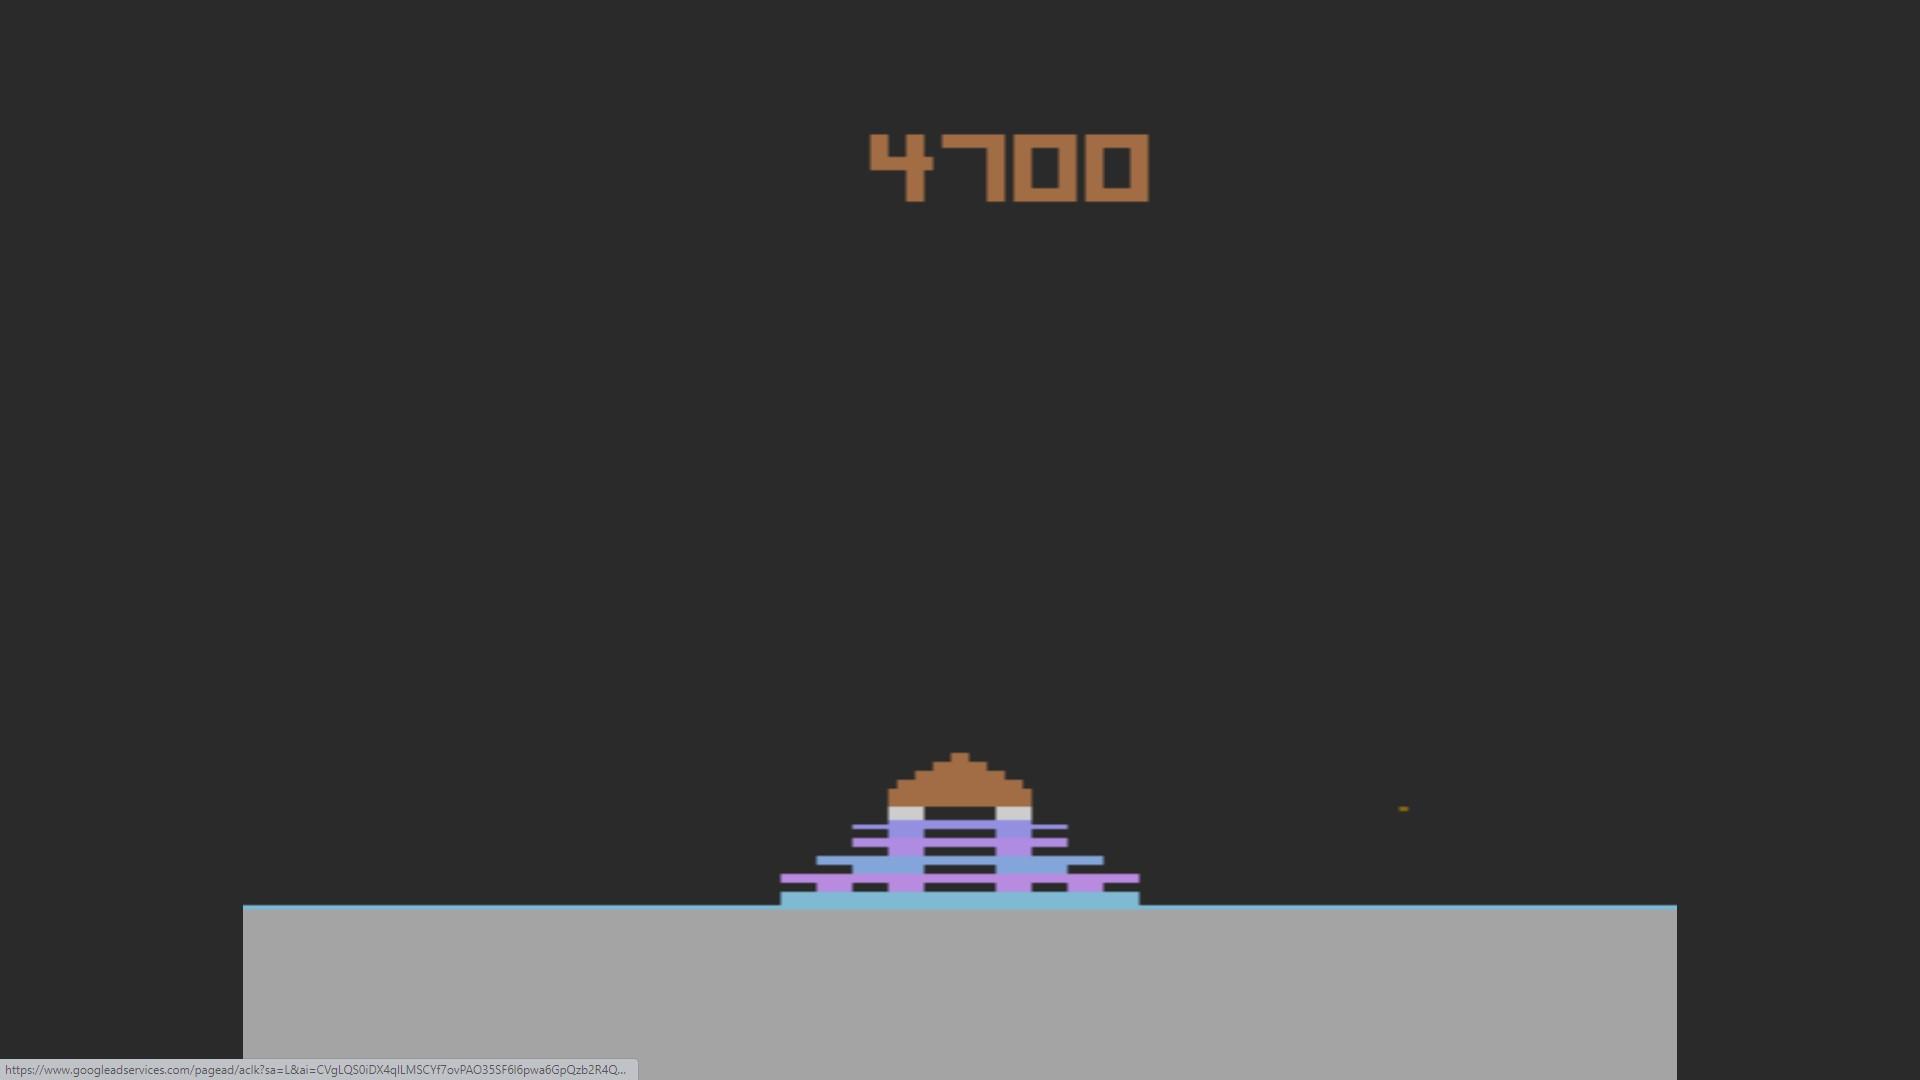 AkinNahtanoj: Angriff der Luftflotten [a.k.a. Paris Attack] (Atari 2600 Emulated Novice/B Mode) 4,700 points on 2020-10-11 13:07:16